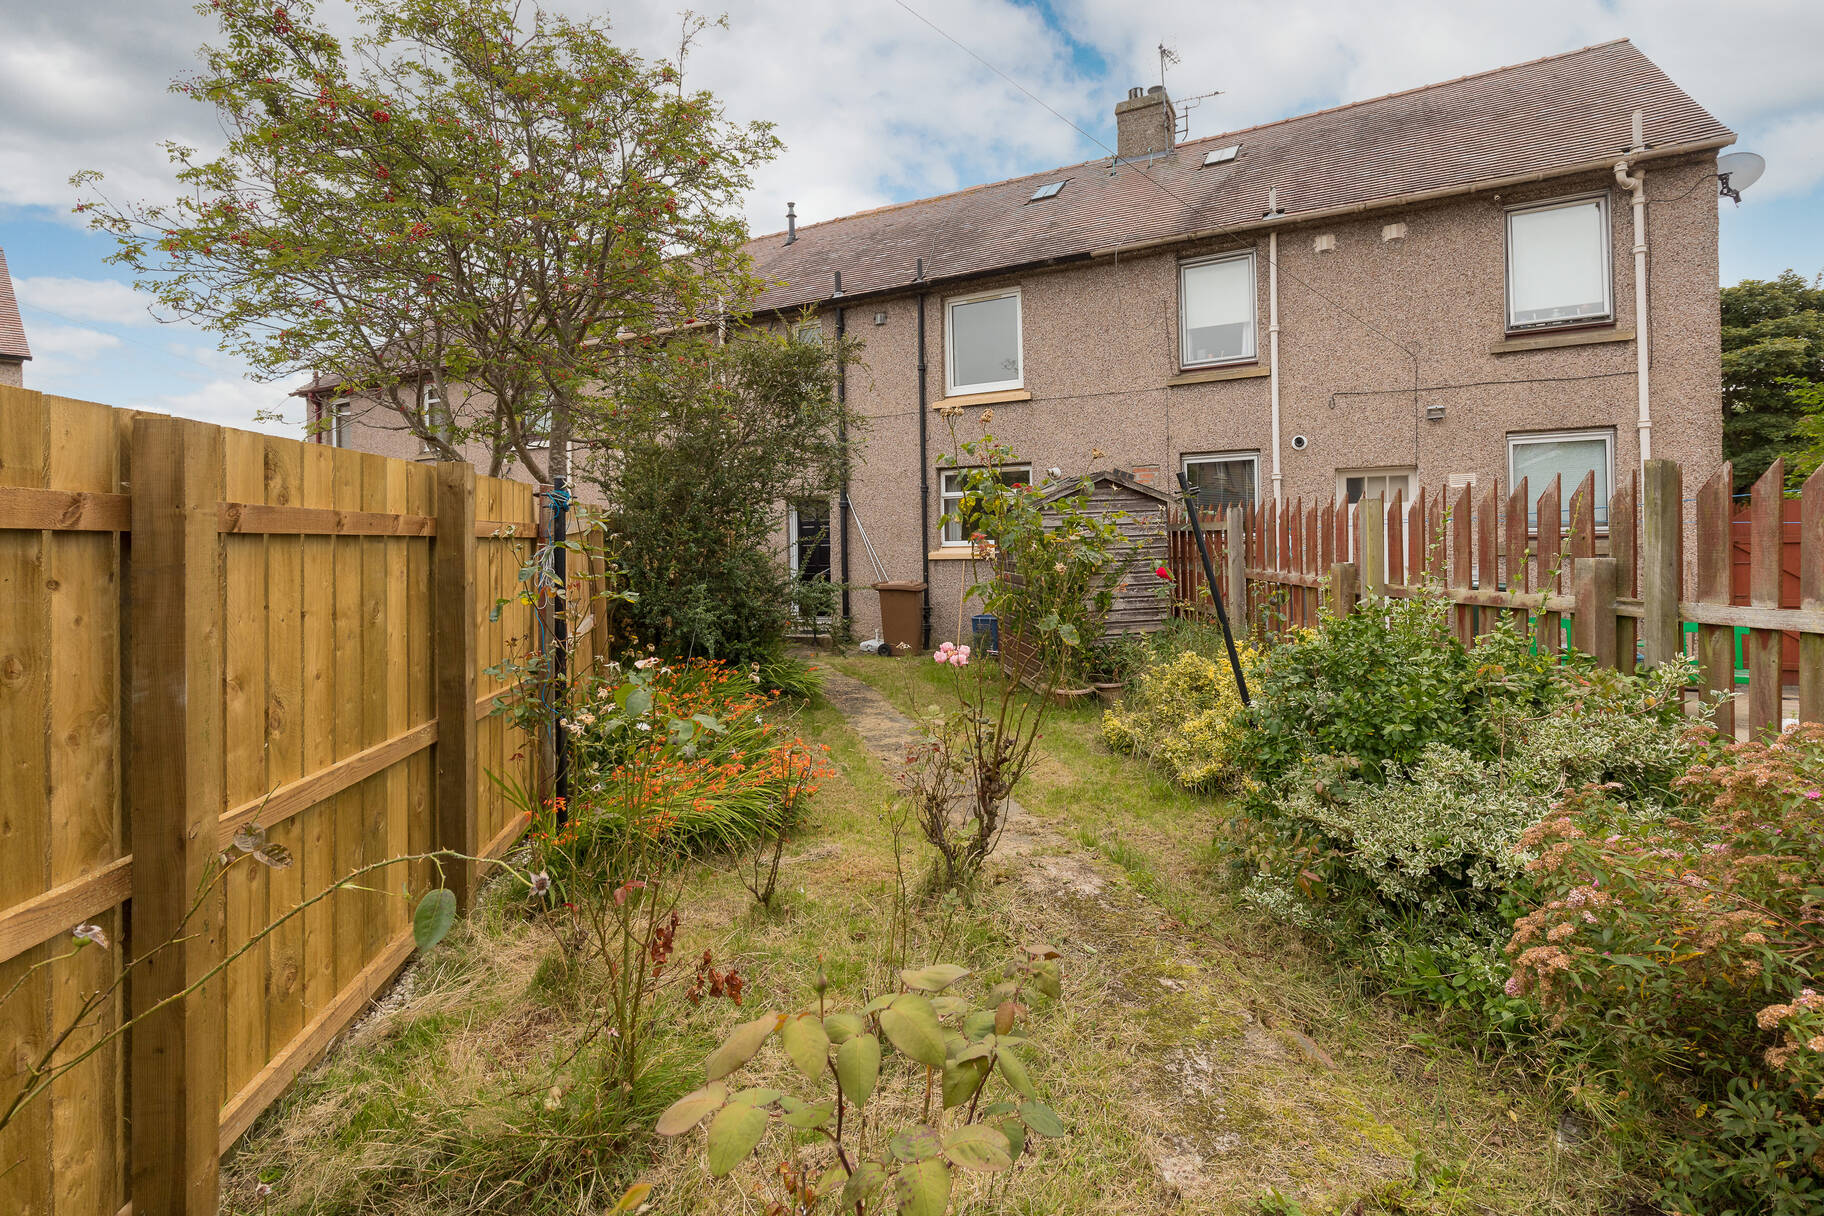 106 Clermiston Drive, Edinburgh, EH4 7PX